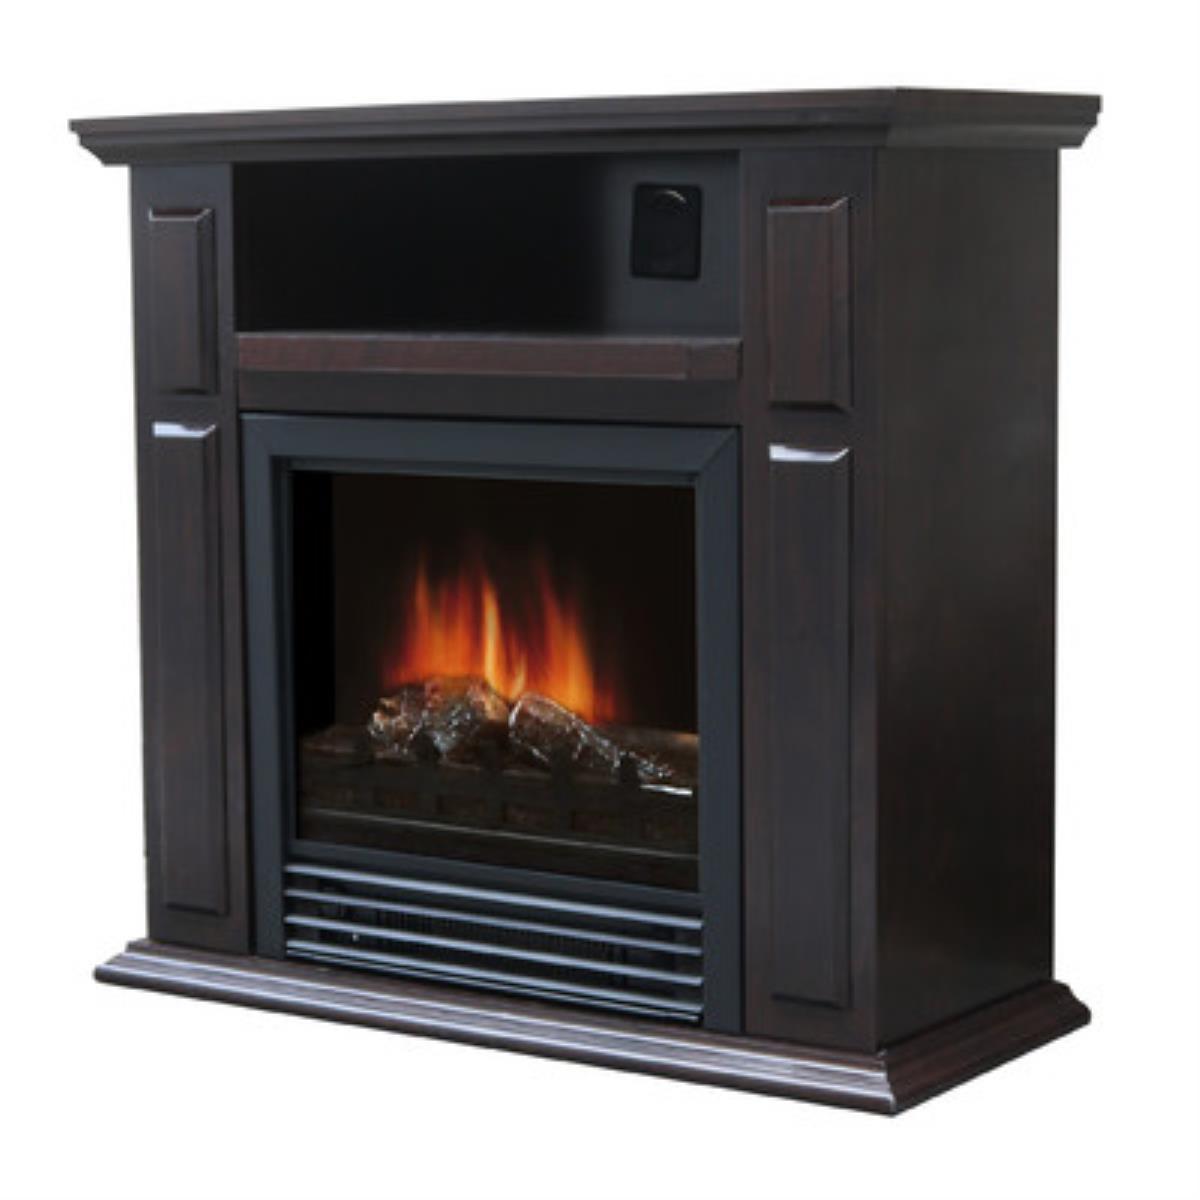 Stonegate 00-931-2628J-Choc Trygve Electric Fireplace